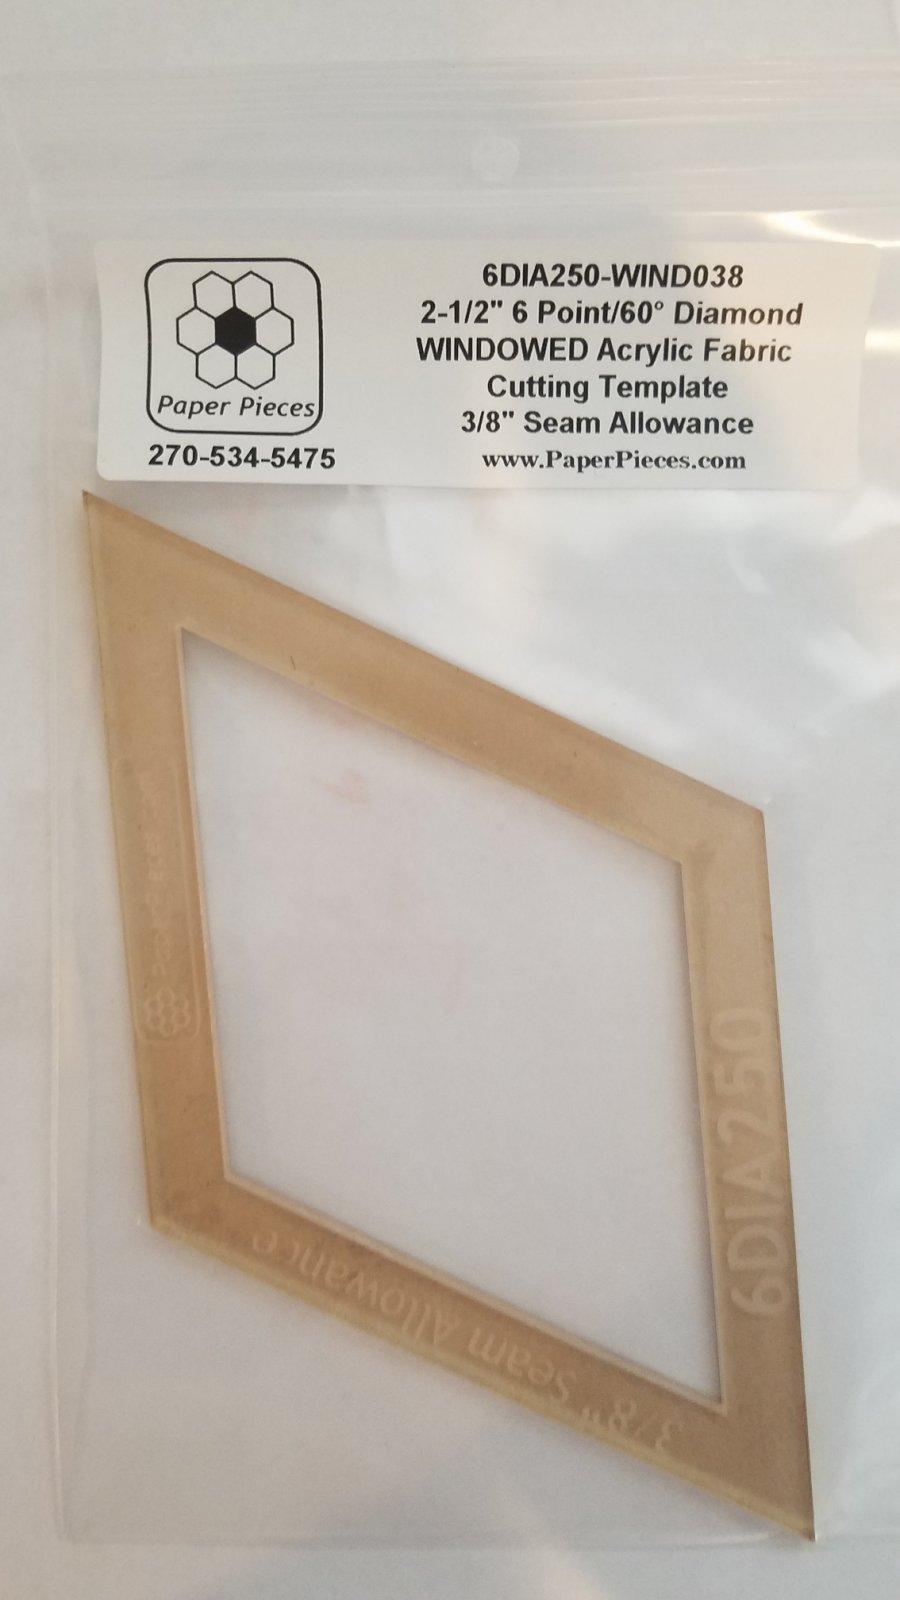 6 Pointed Diamond Acrylic Windowed Template